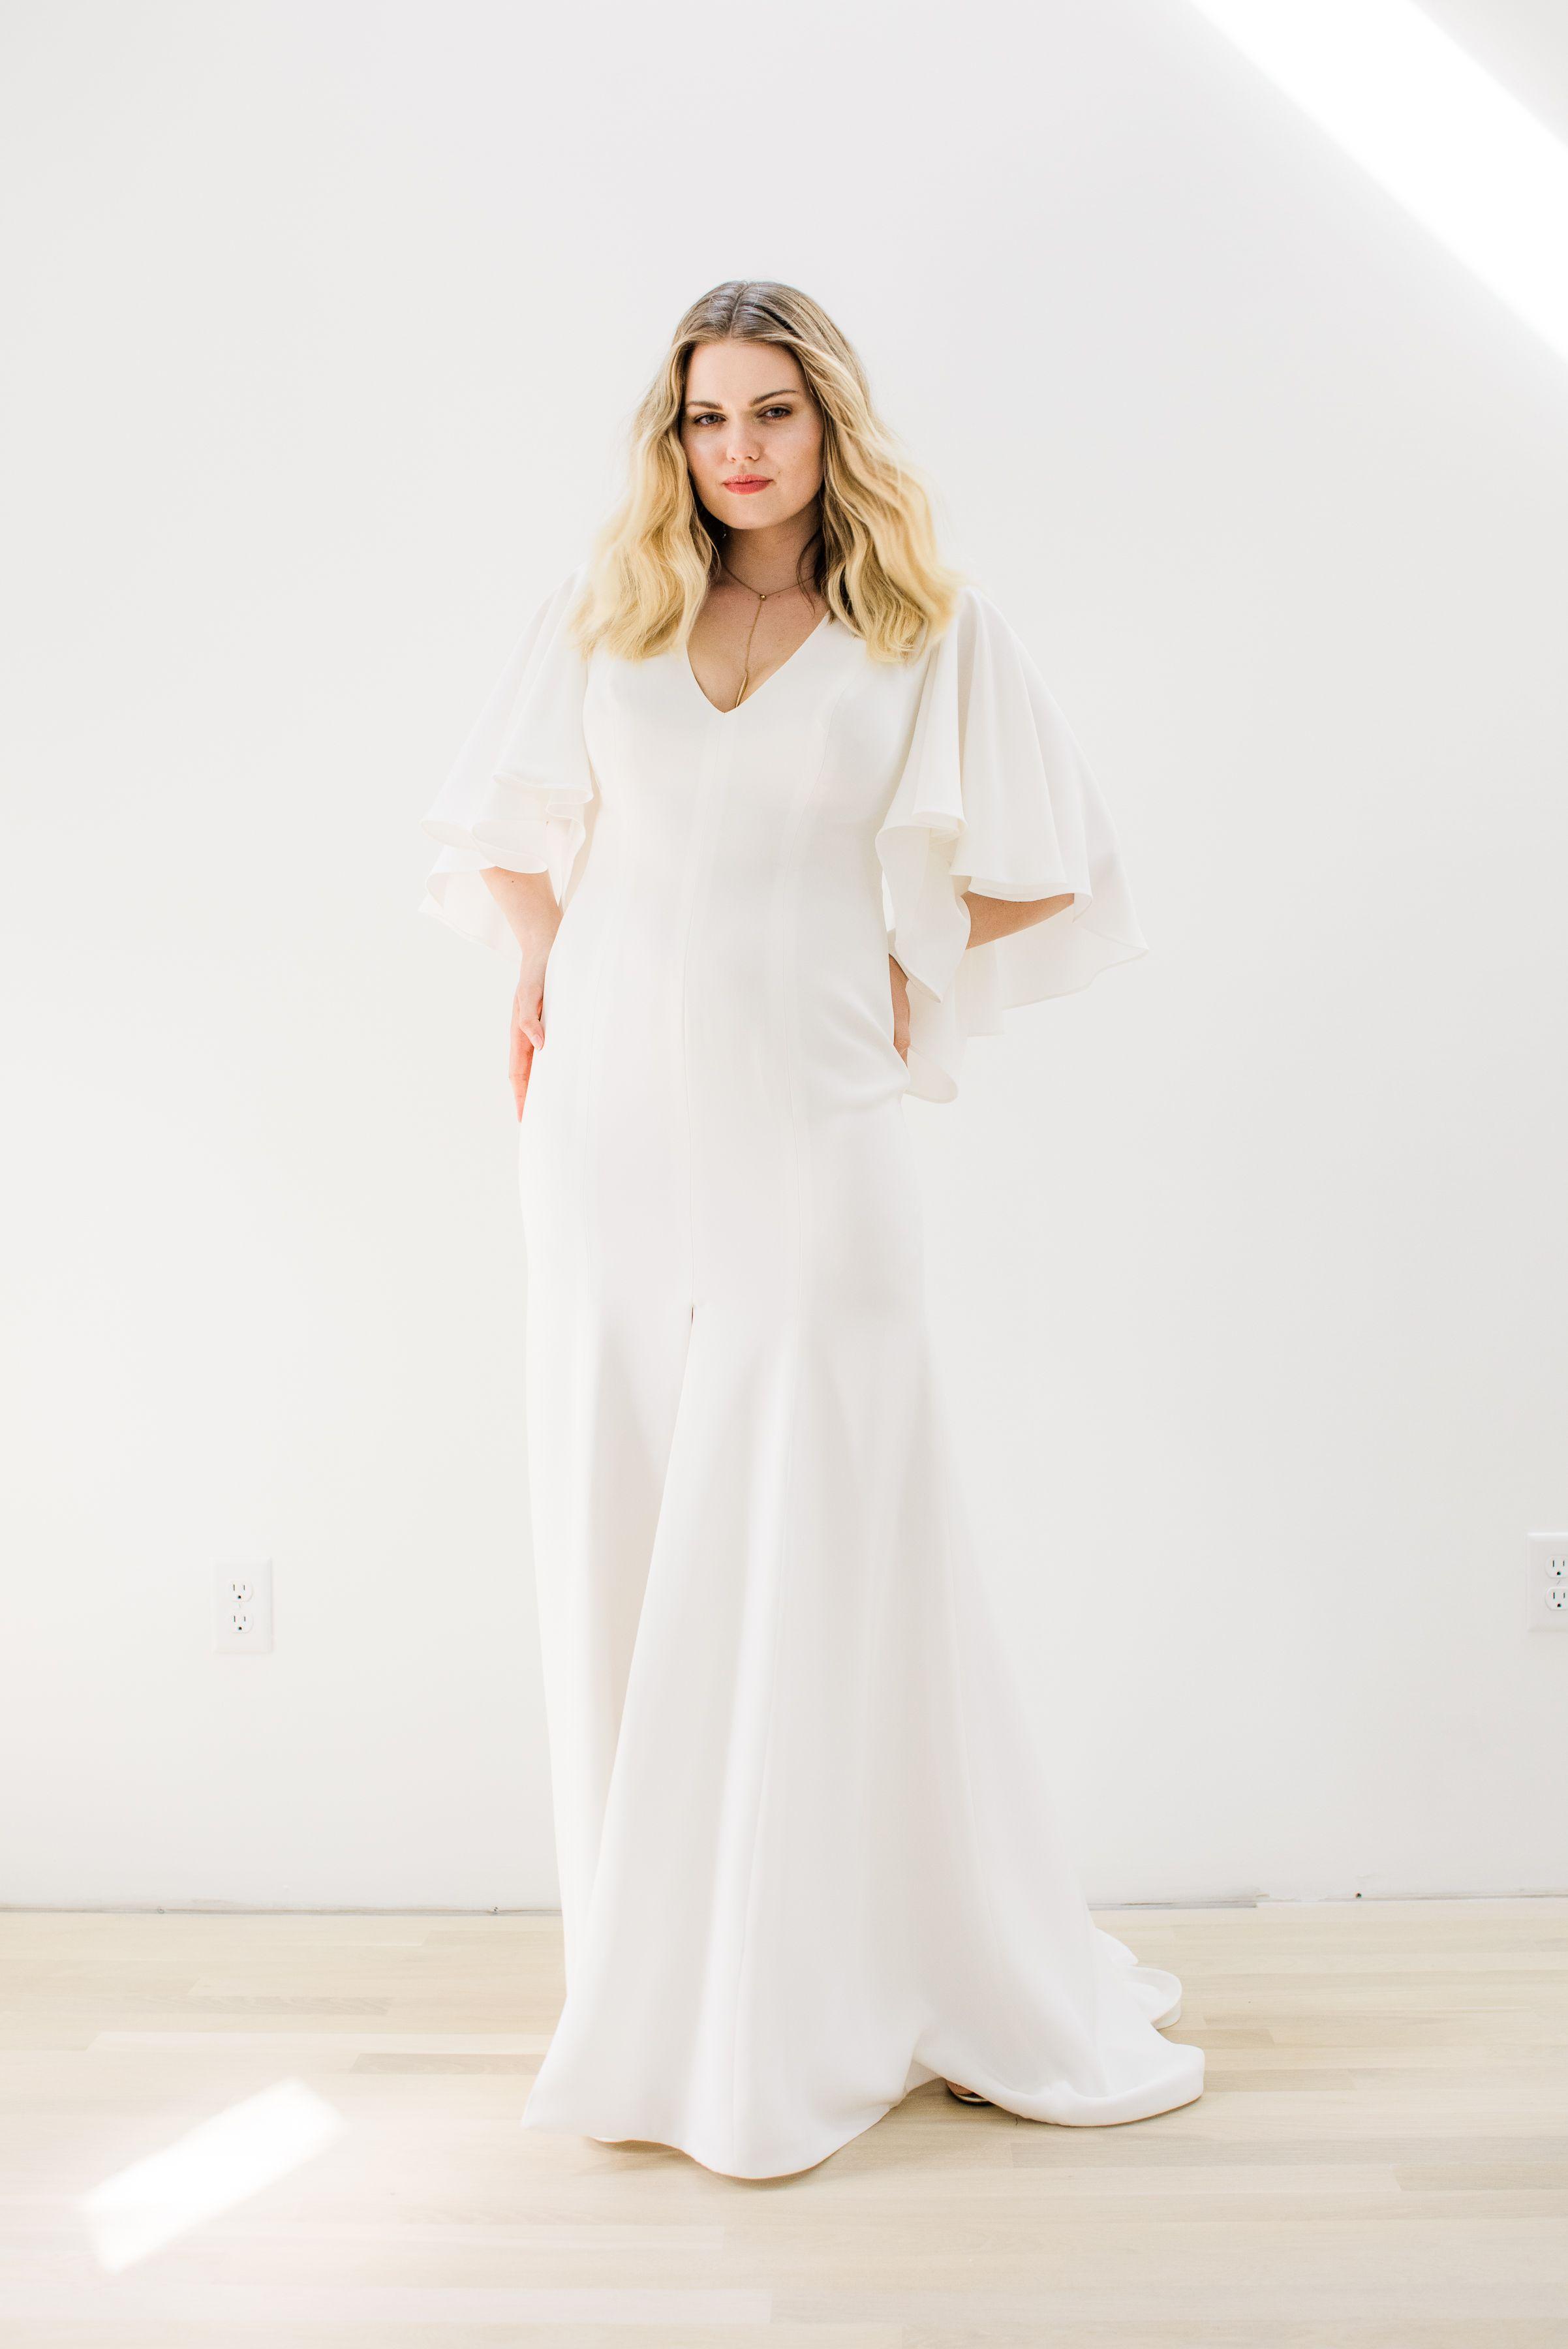 Drape Sleeve Wedding Dress For The Modern Minimalist Bride